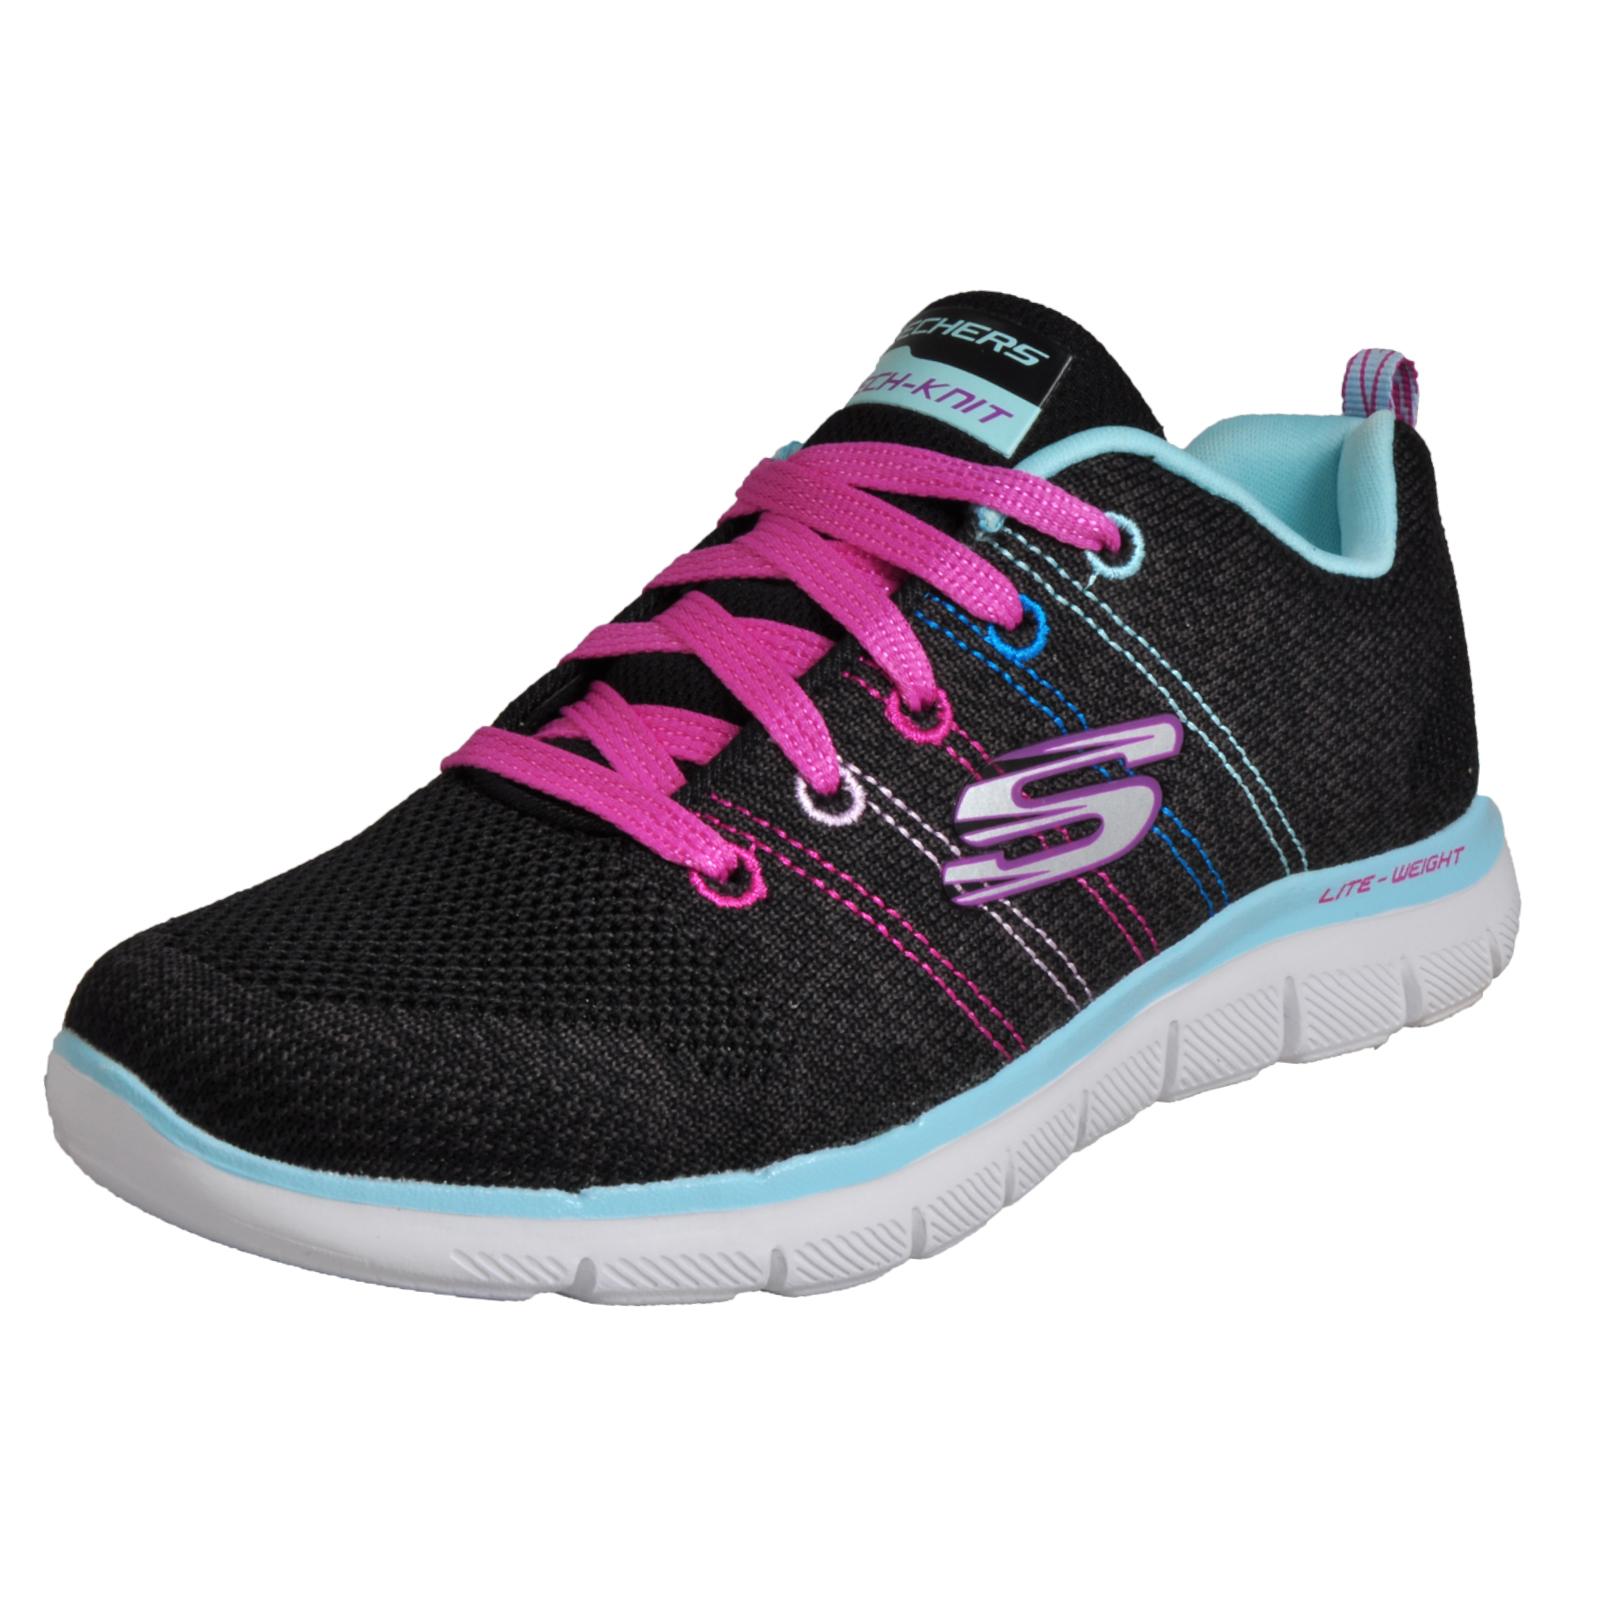 Details about Skechers Flex Appeal 2.0 High Energy Women s Girls Memory Foam  Casual Trainers B f222832b9b